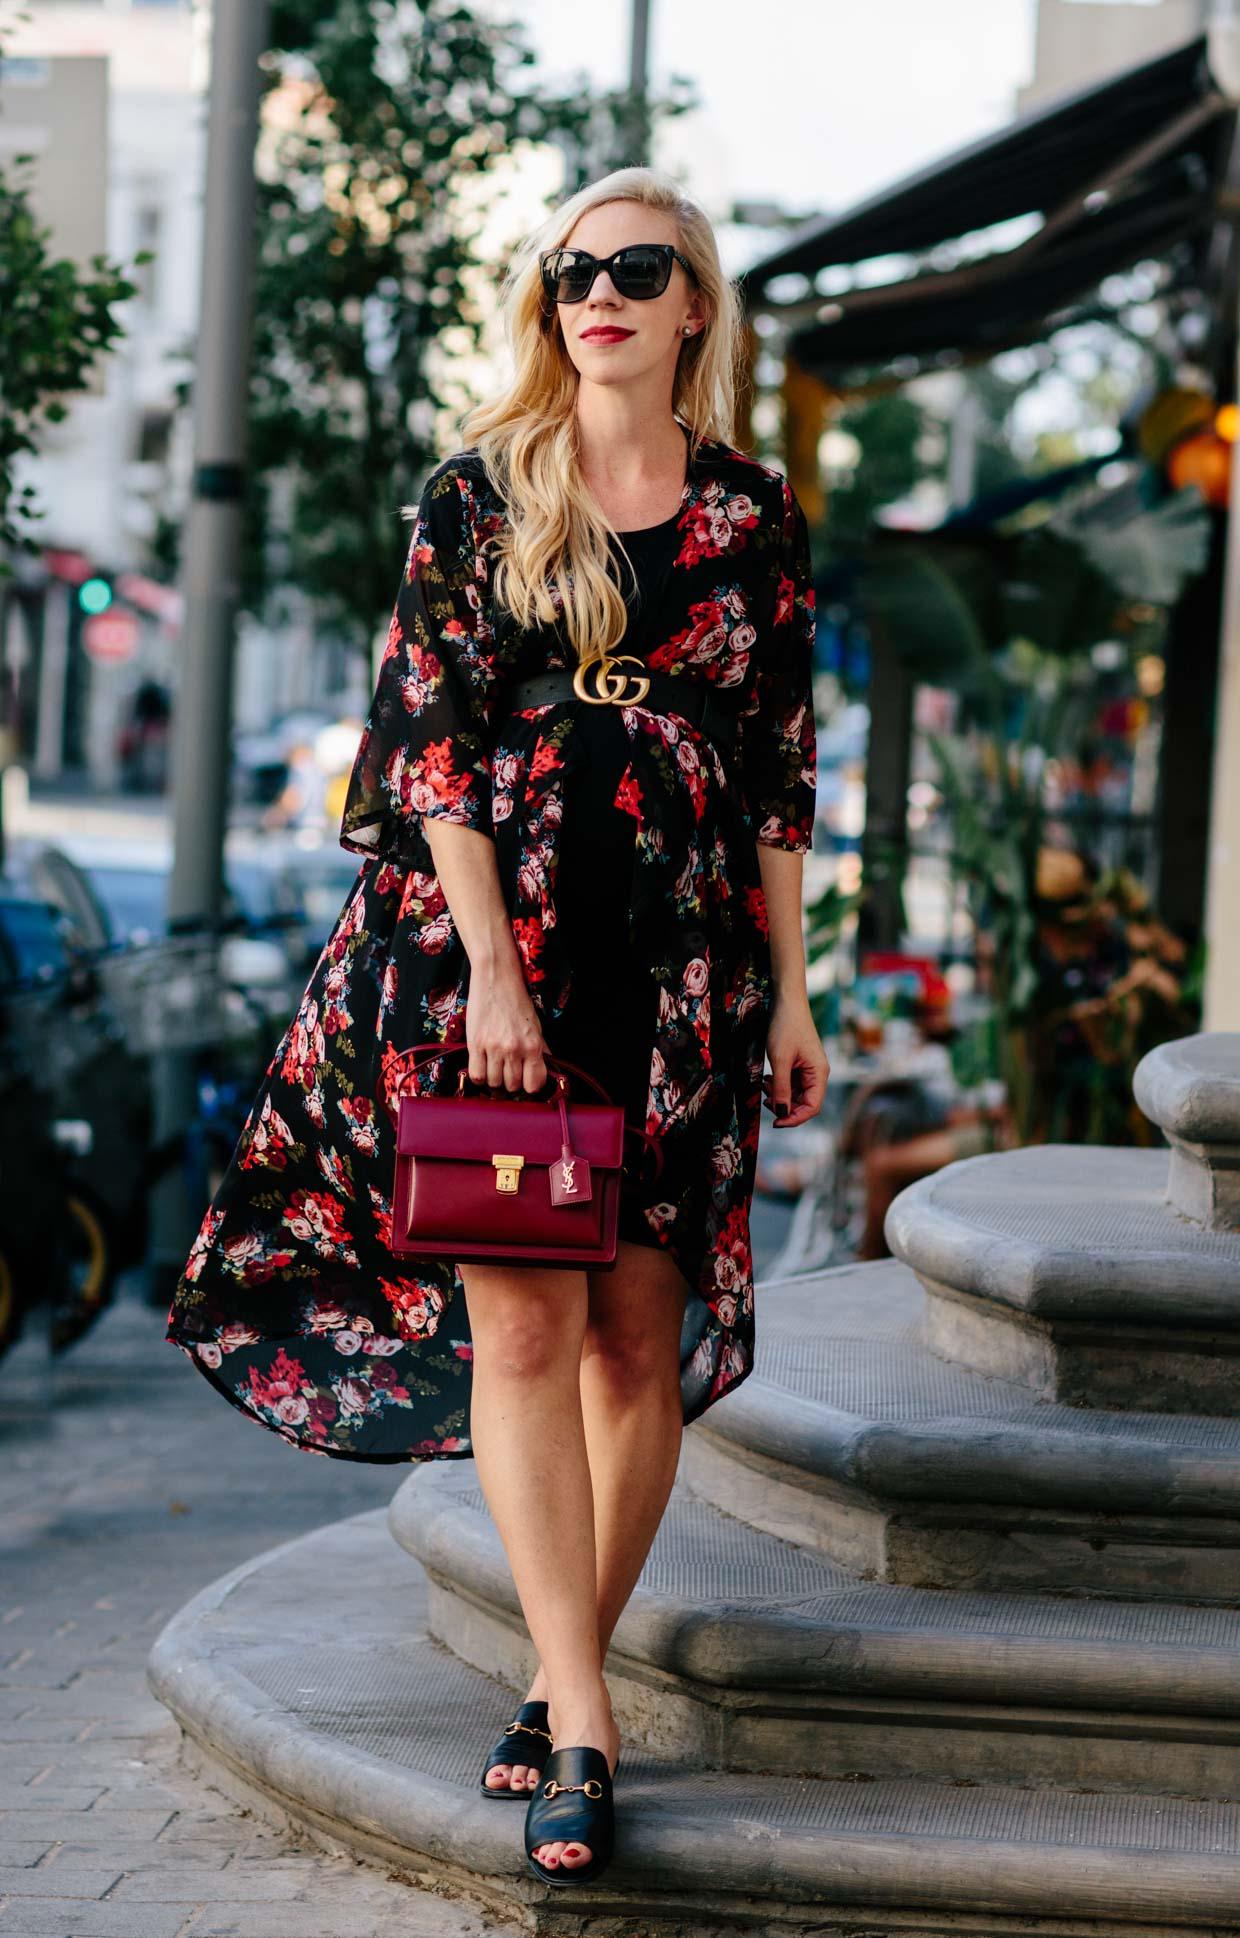 86cc6f468e9 Meagan Brandon fashion blogger shows how to wear dark floral print for fall  with floral print kimono